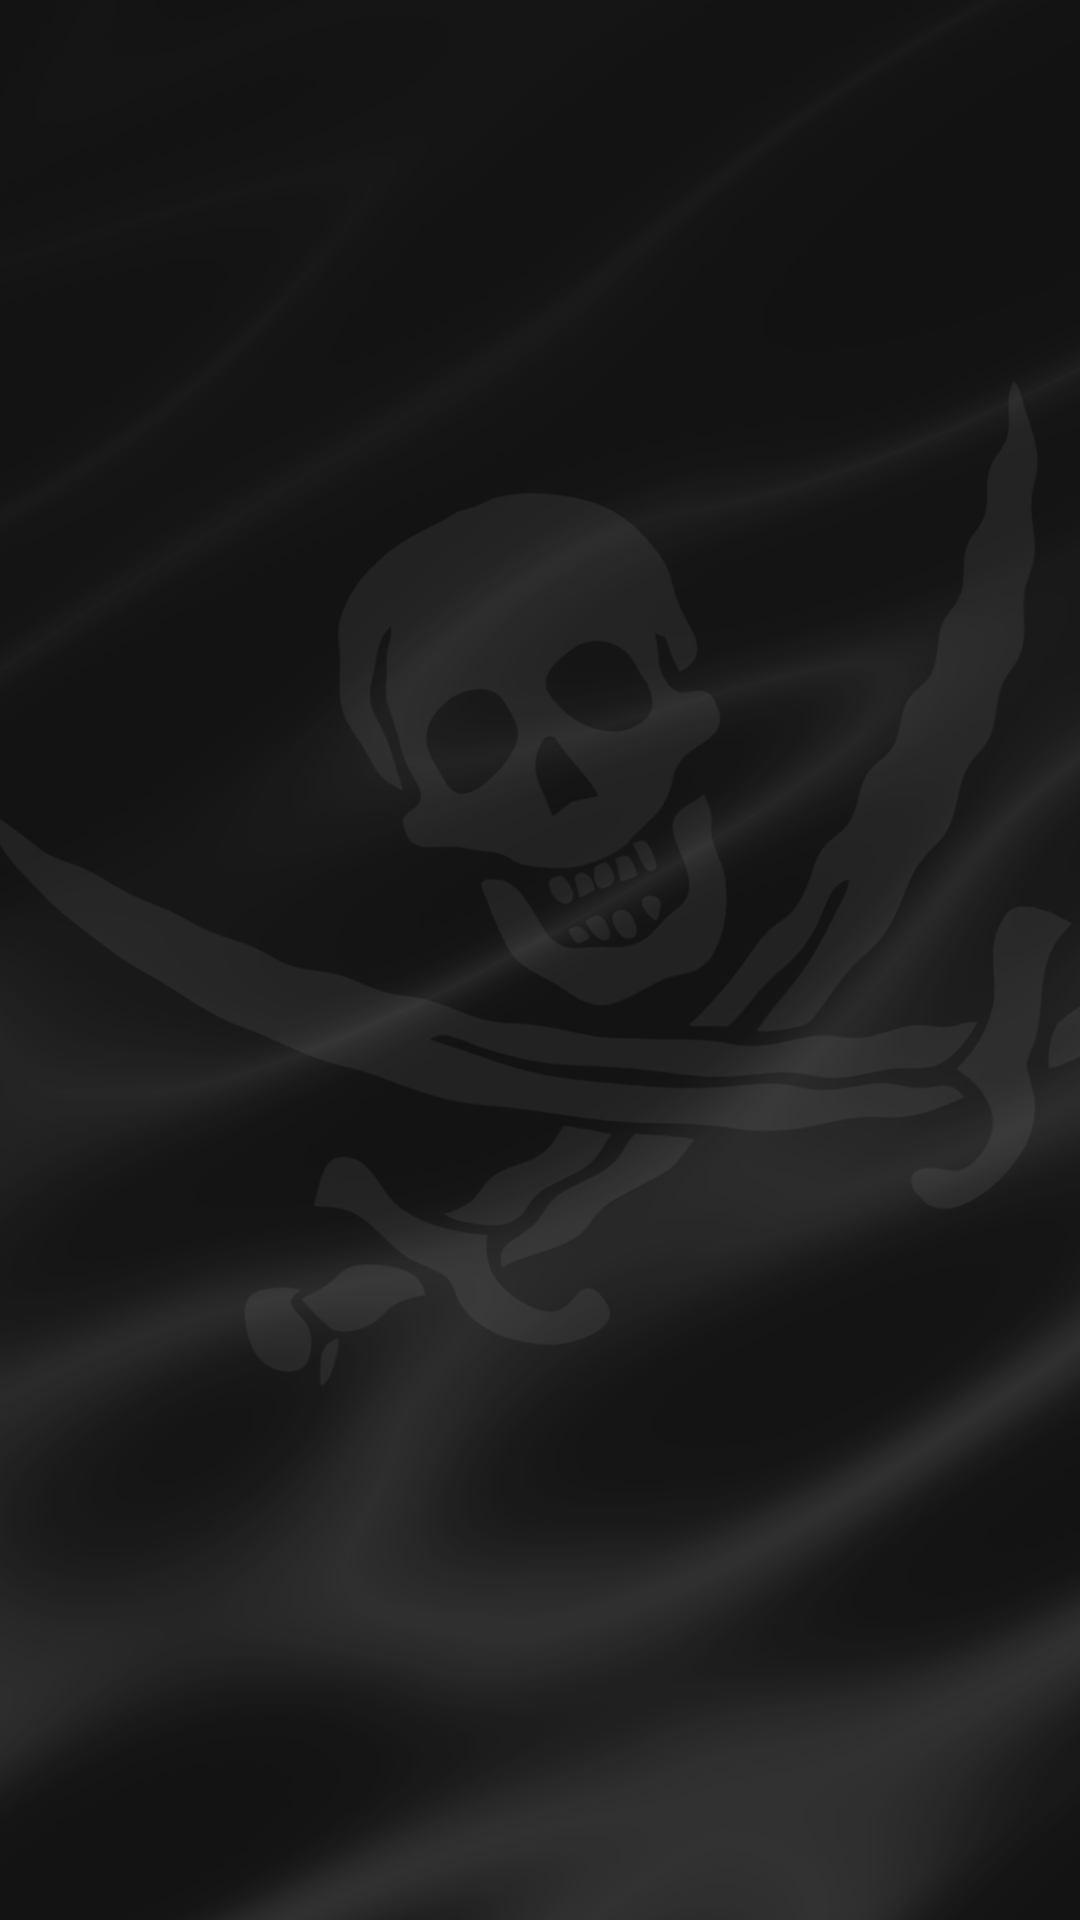 Wallpaper Pirate Gratis Stuff Furs Handy